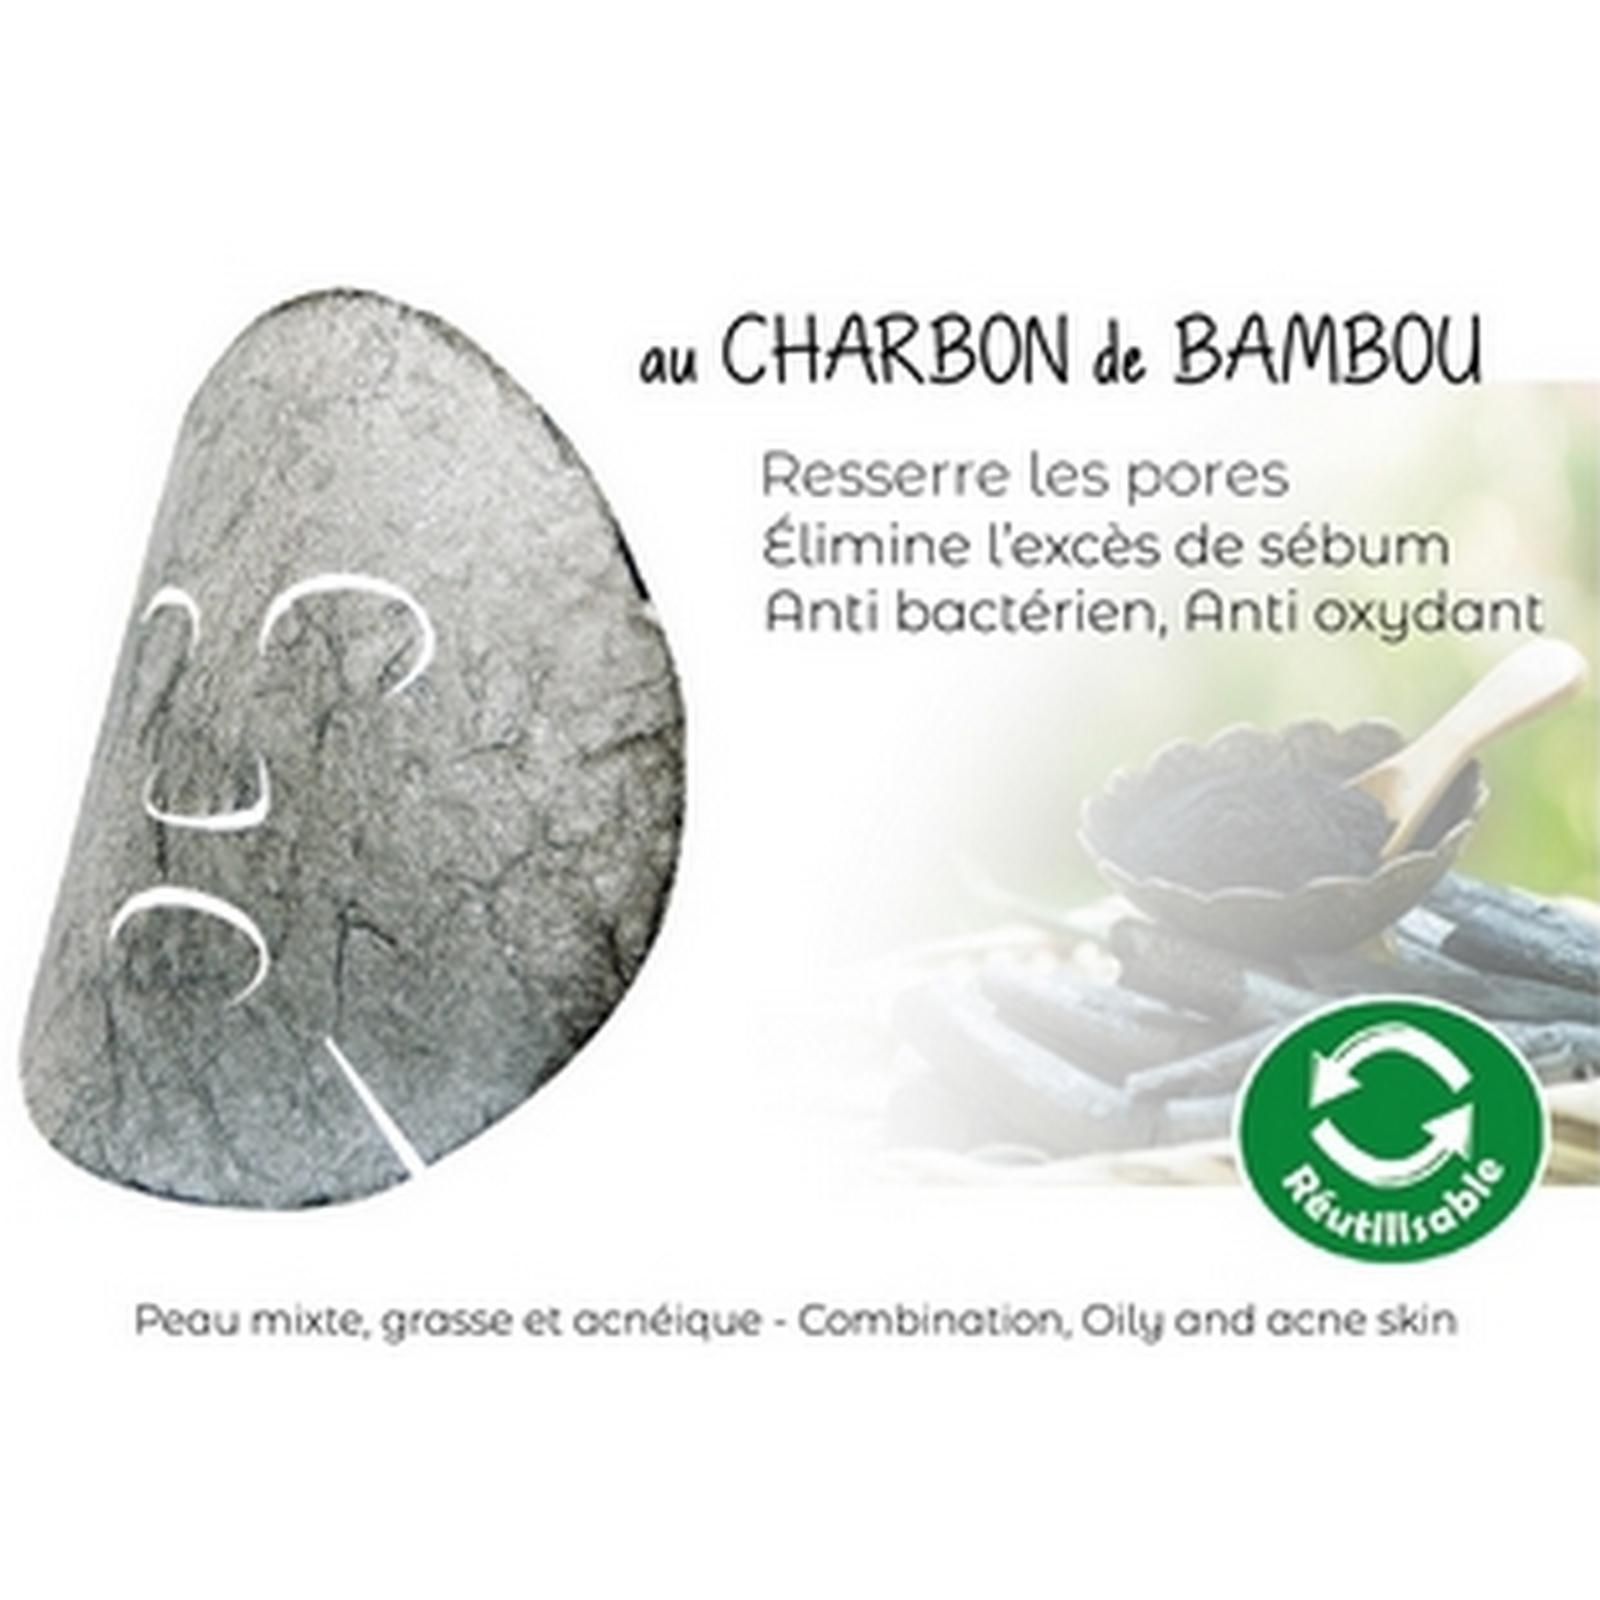 Masque Konjac au Charbon de Bambou